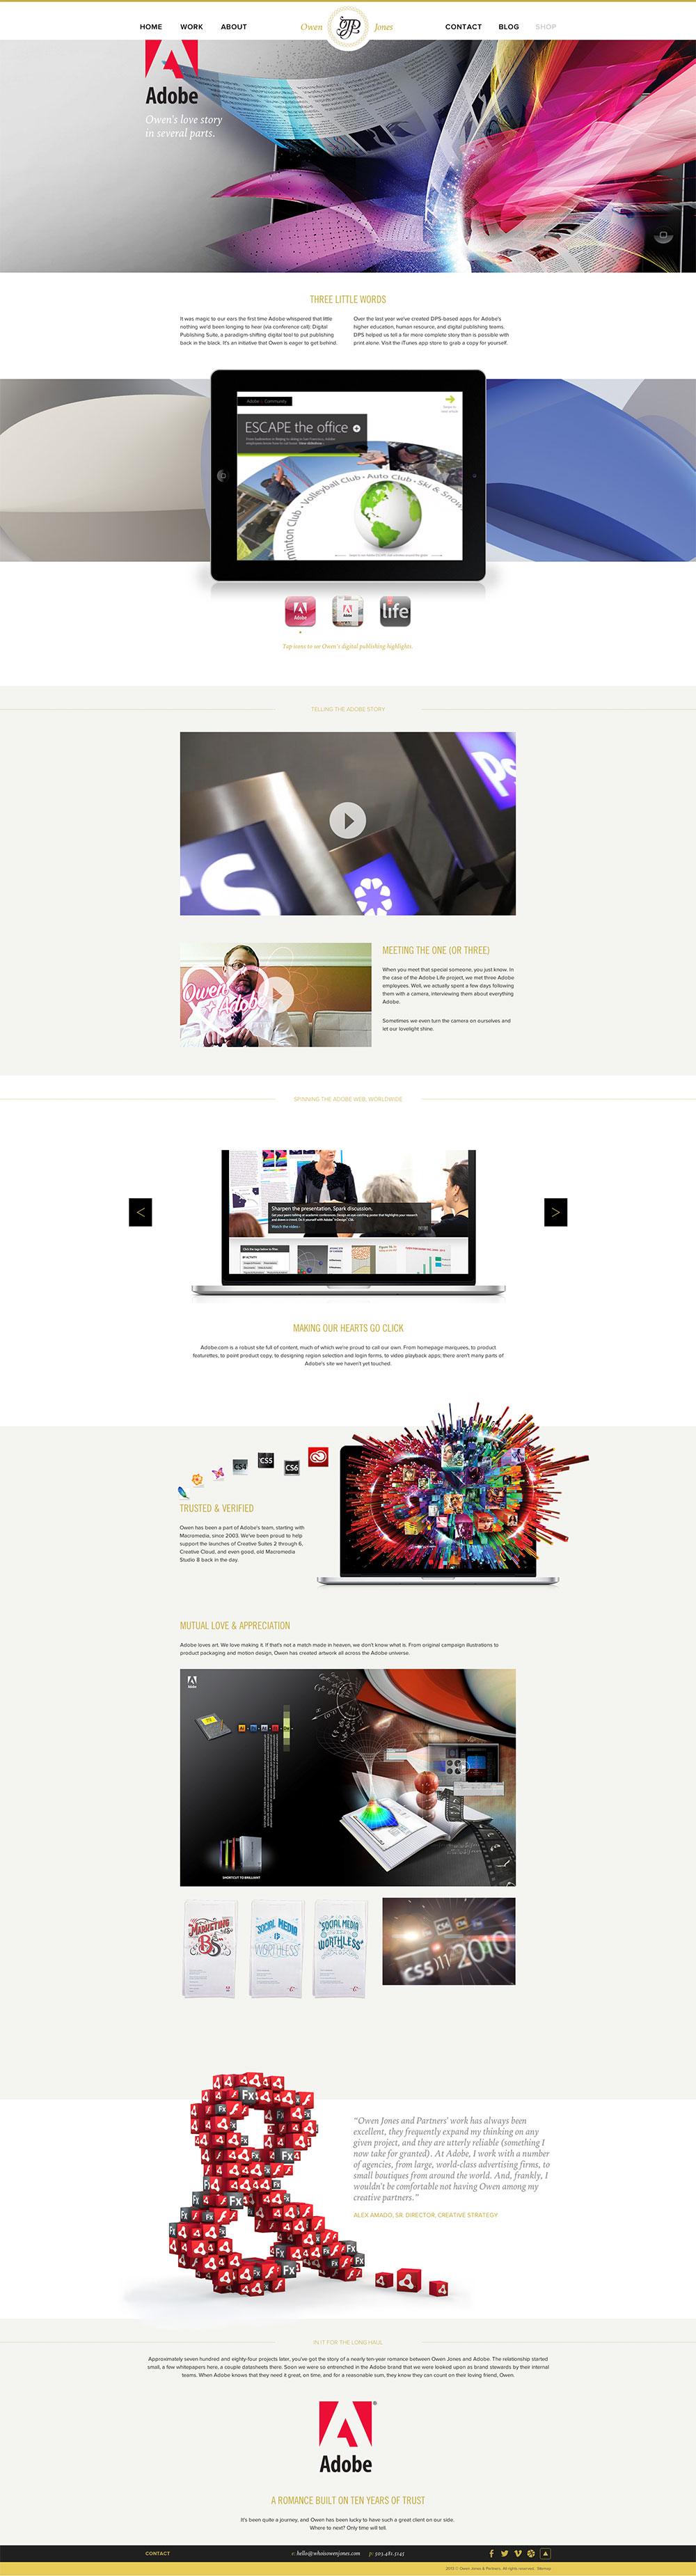 OJP-Adobe.jpg